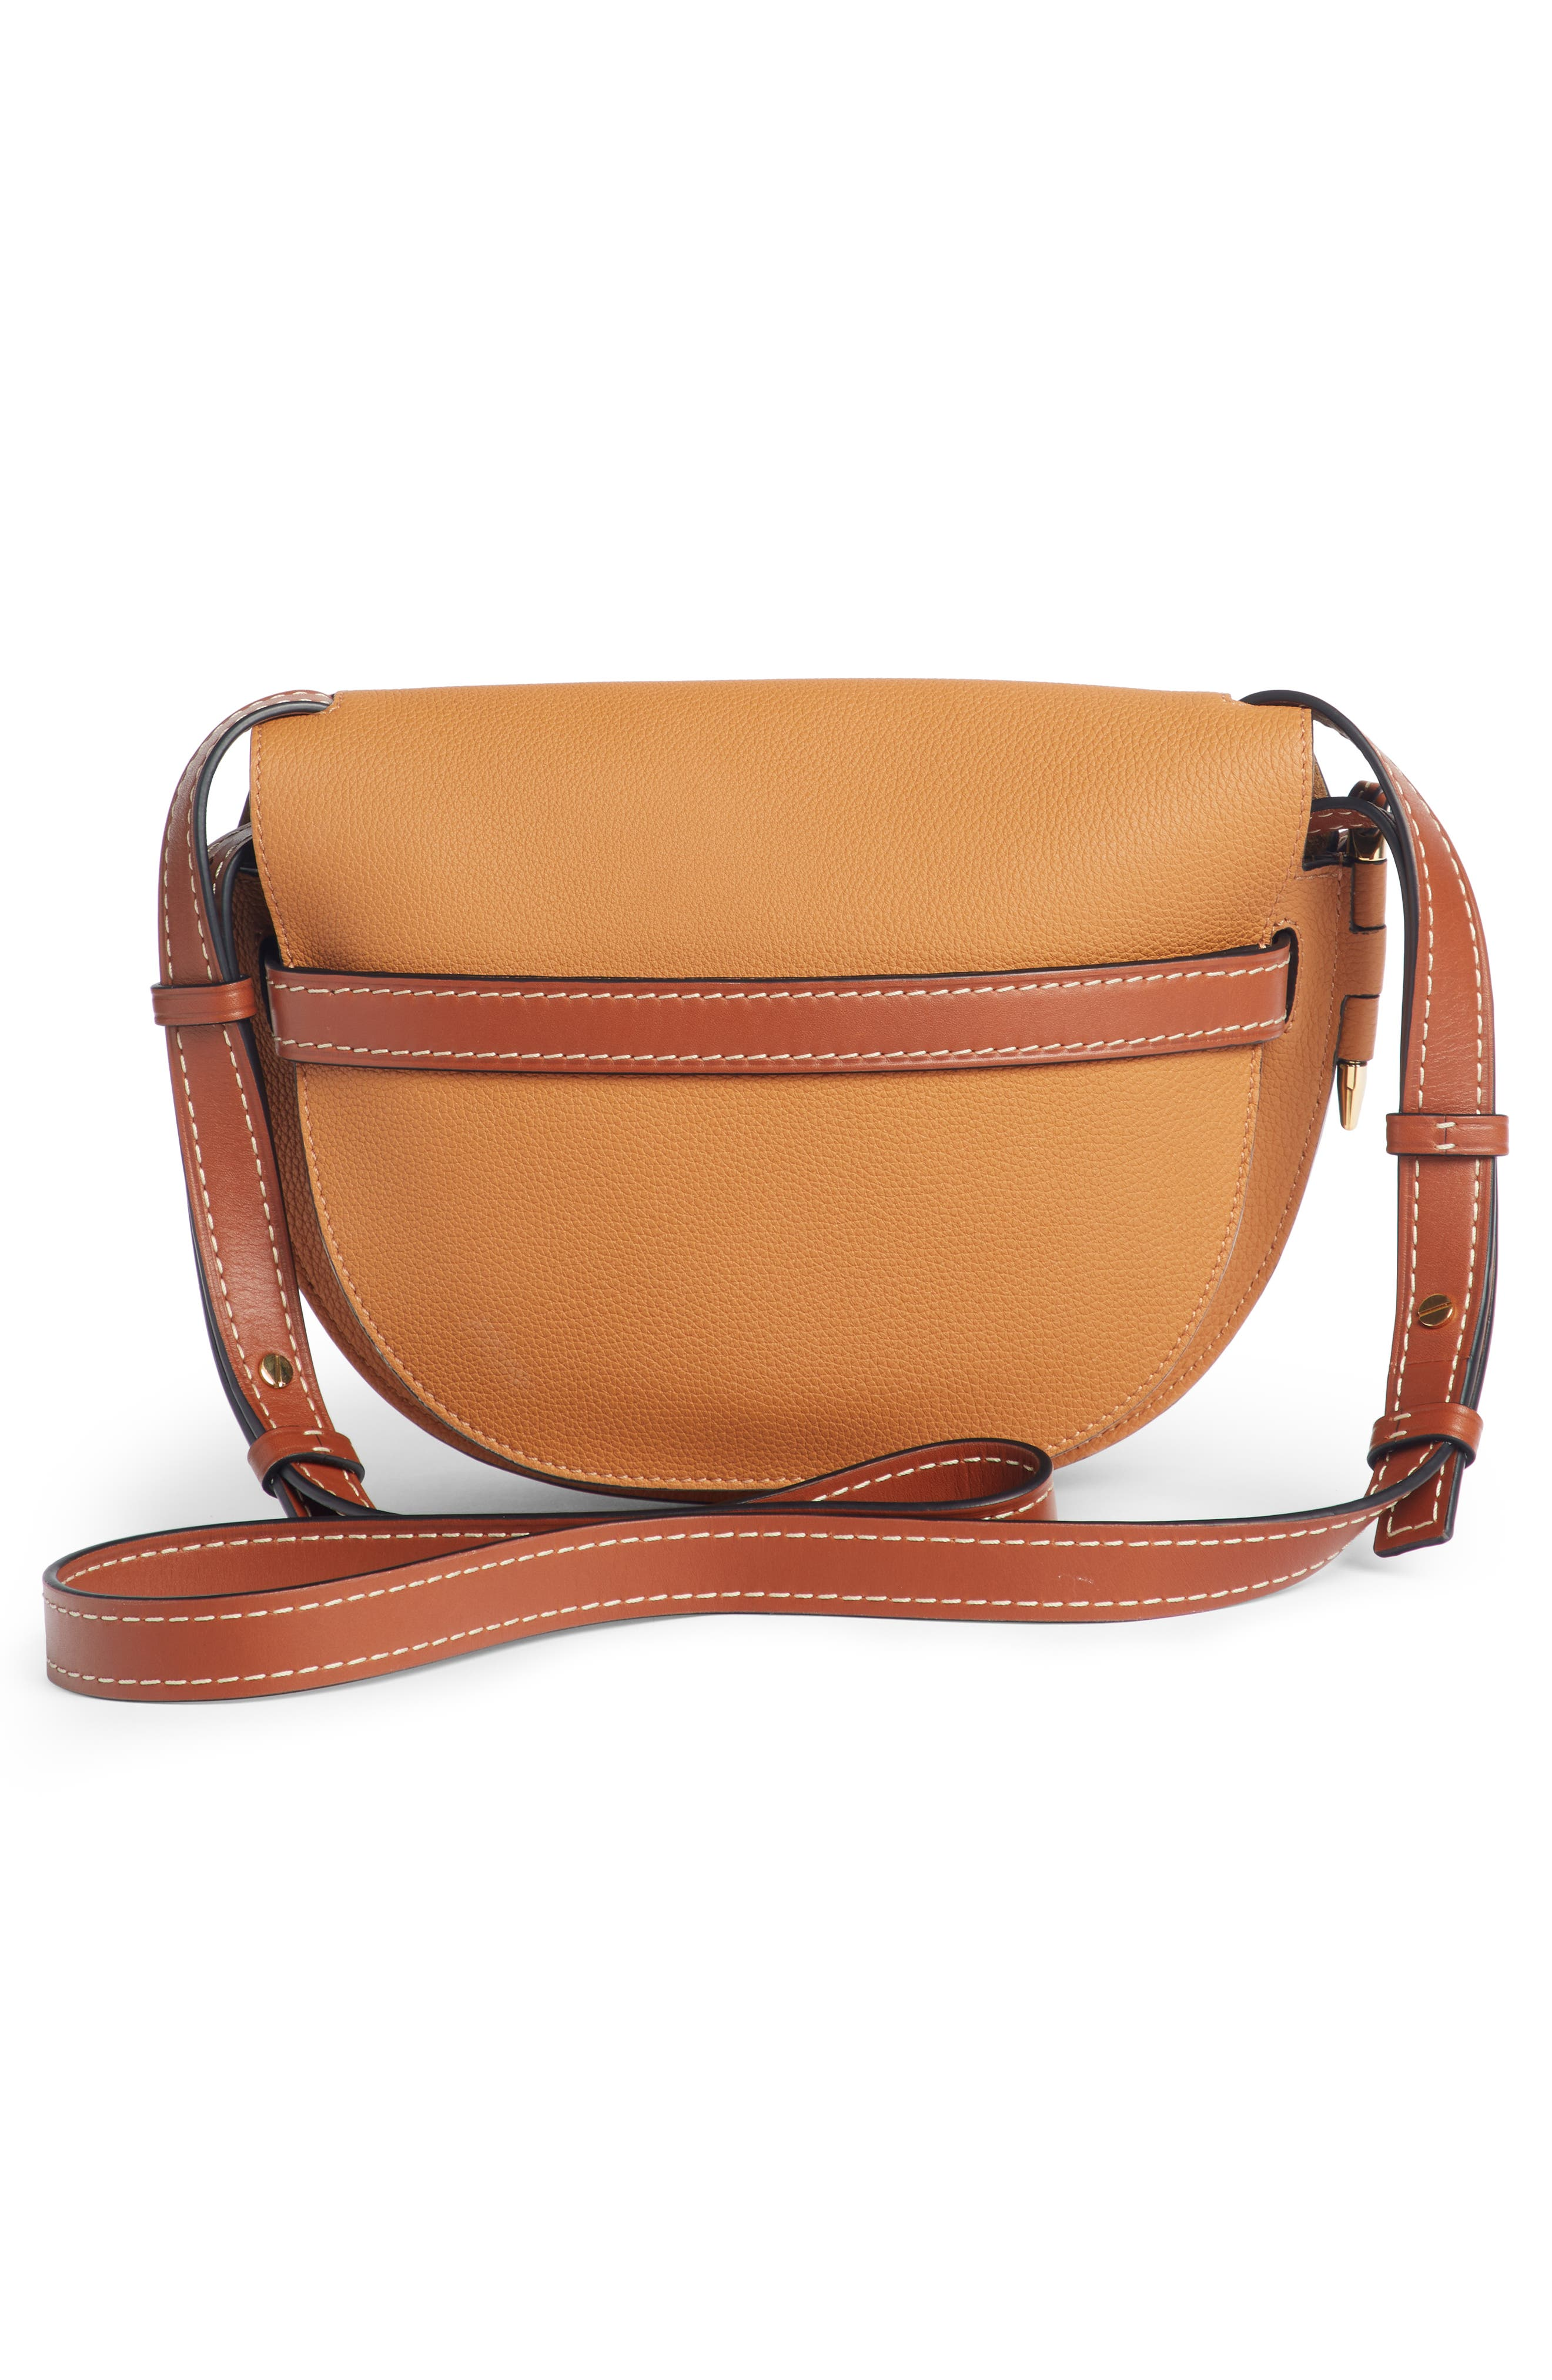 Small Gate Leather Crossbody Bag,                             Alternate thumbnail 3, color,                             LIGHT CARAMEL/ PECAN